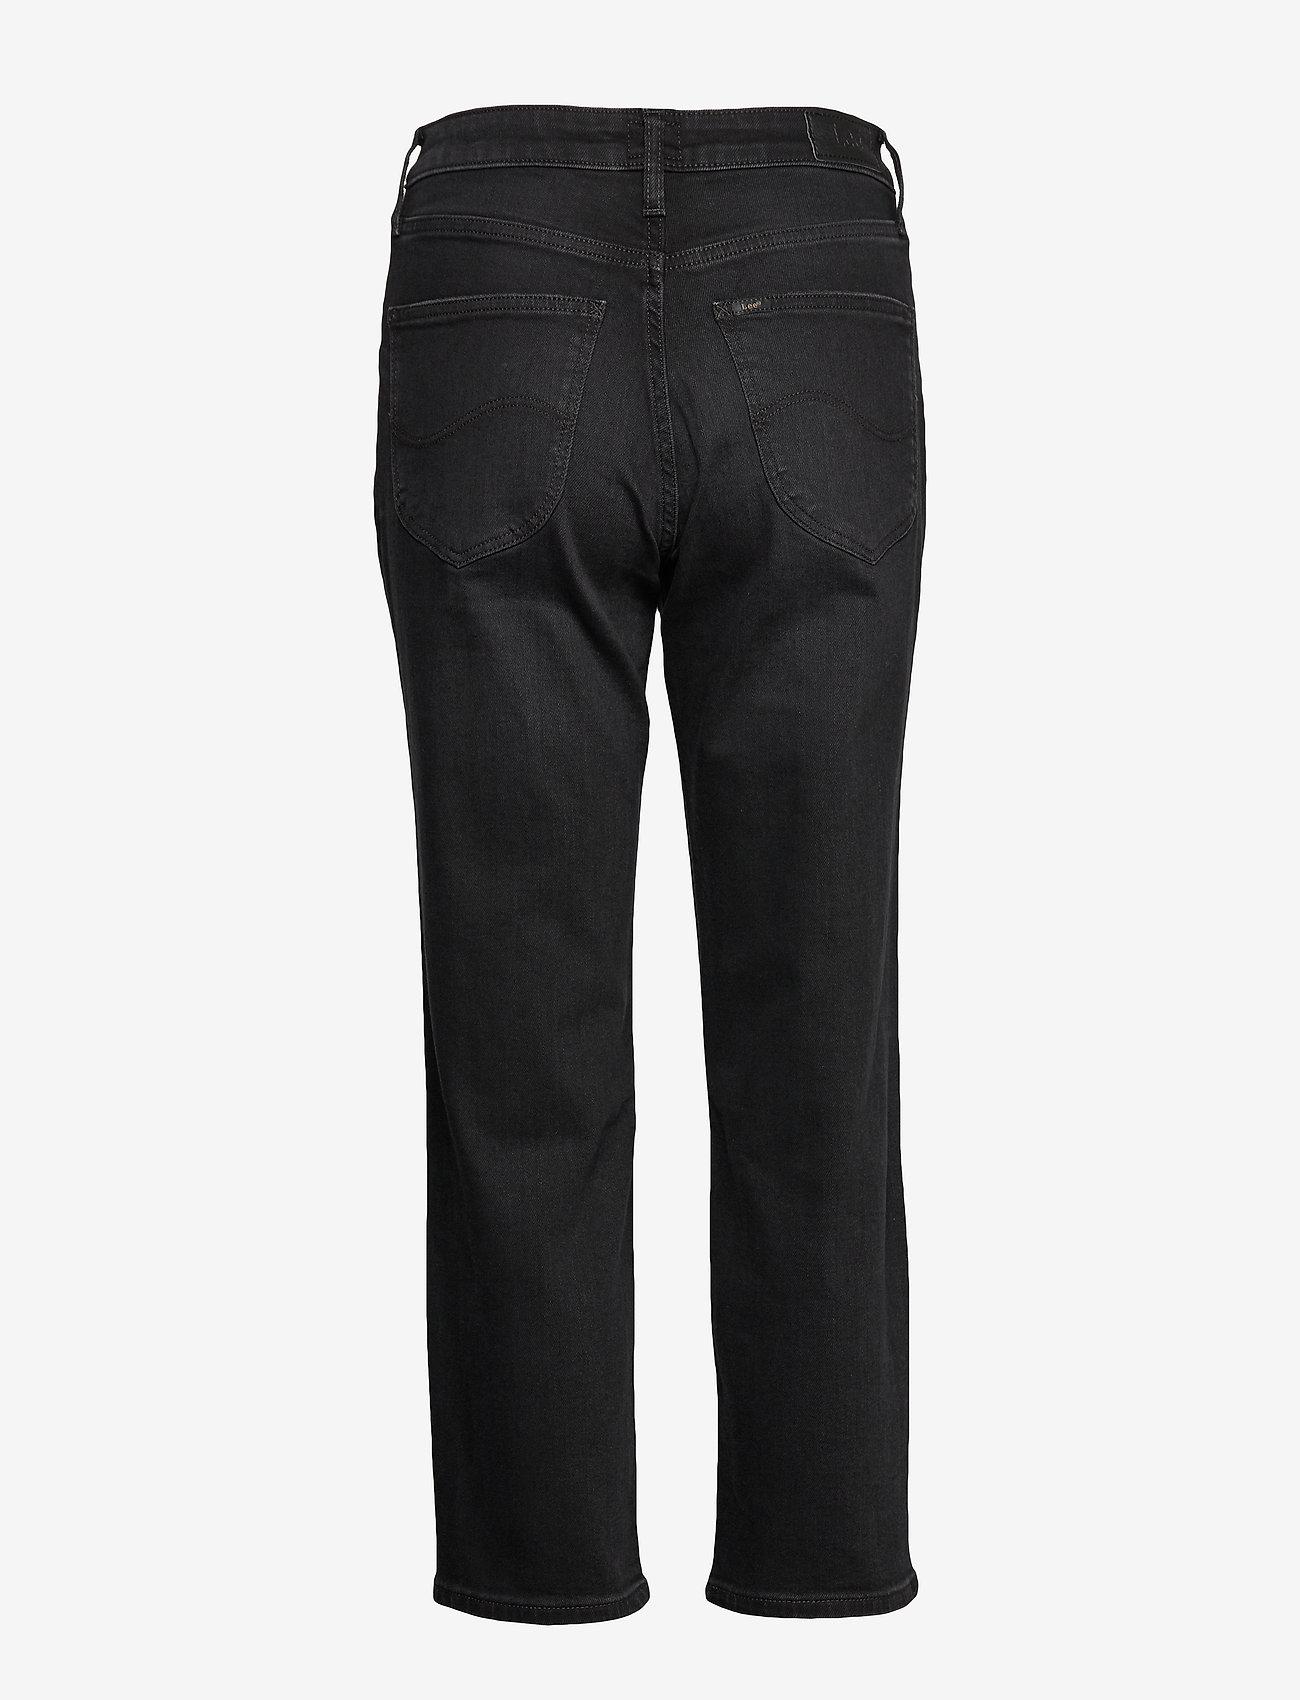 Lee Jeans - CAROL - straight jeans - black worn - 1